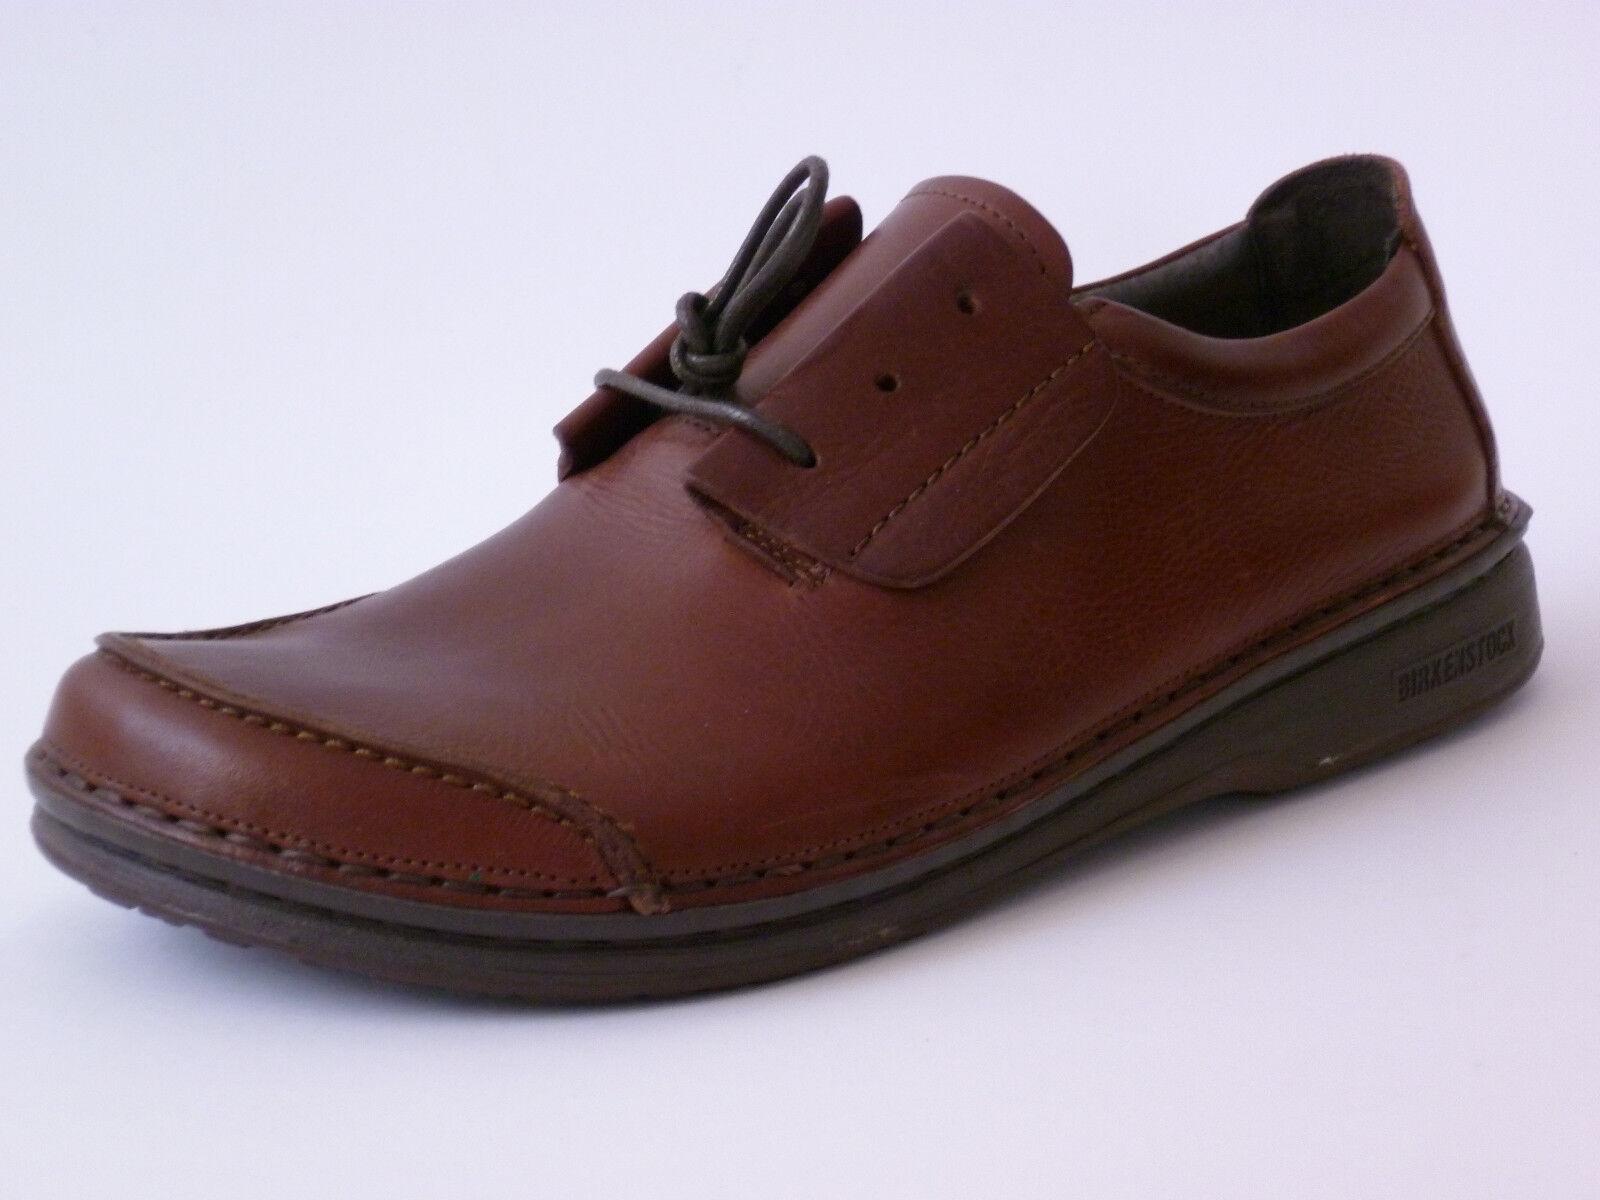 Footprints Delfi By Birkenstock Sottile 41 Marrone-Rosso pelle Sottile Birkenstock Nuovo 88f465